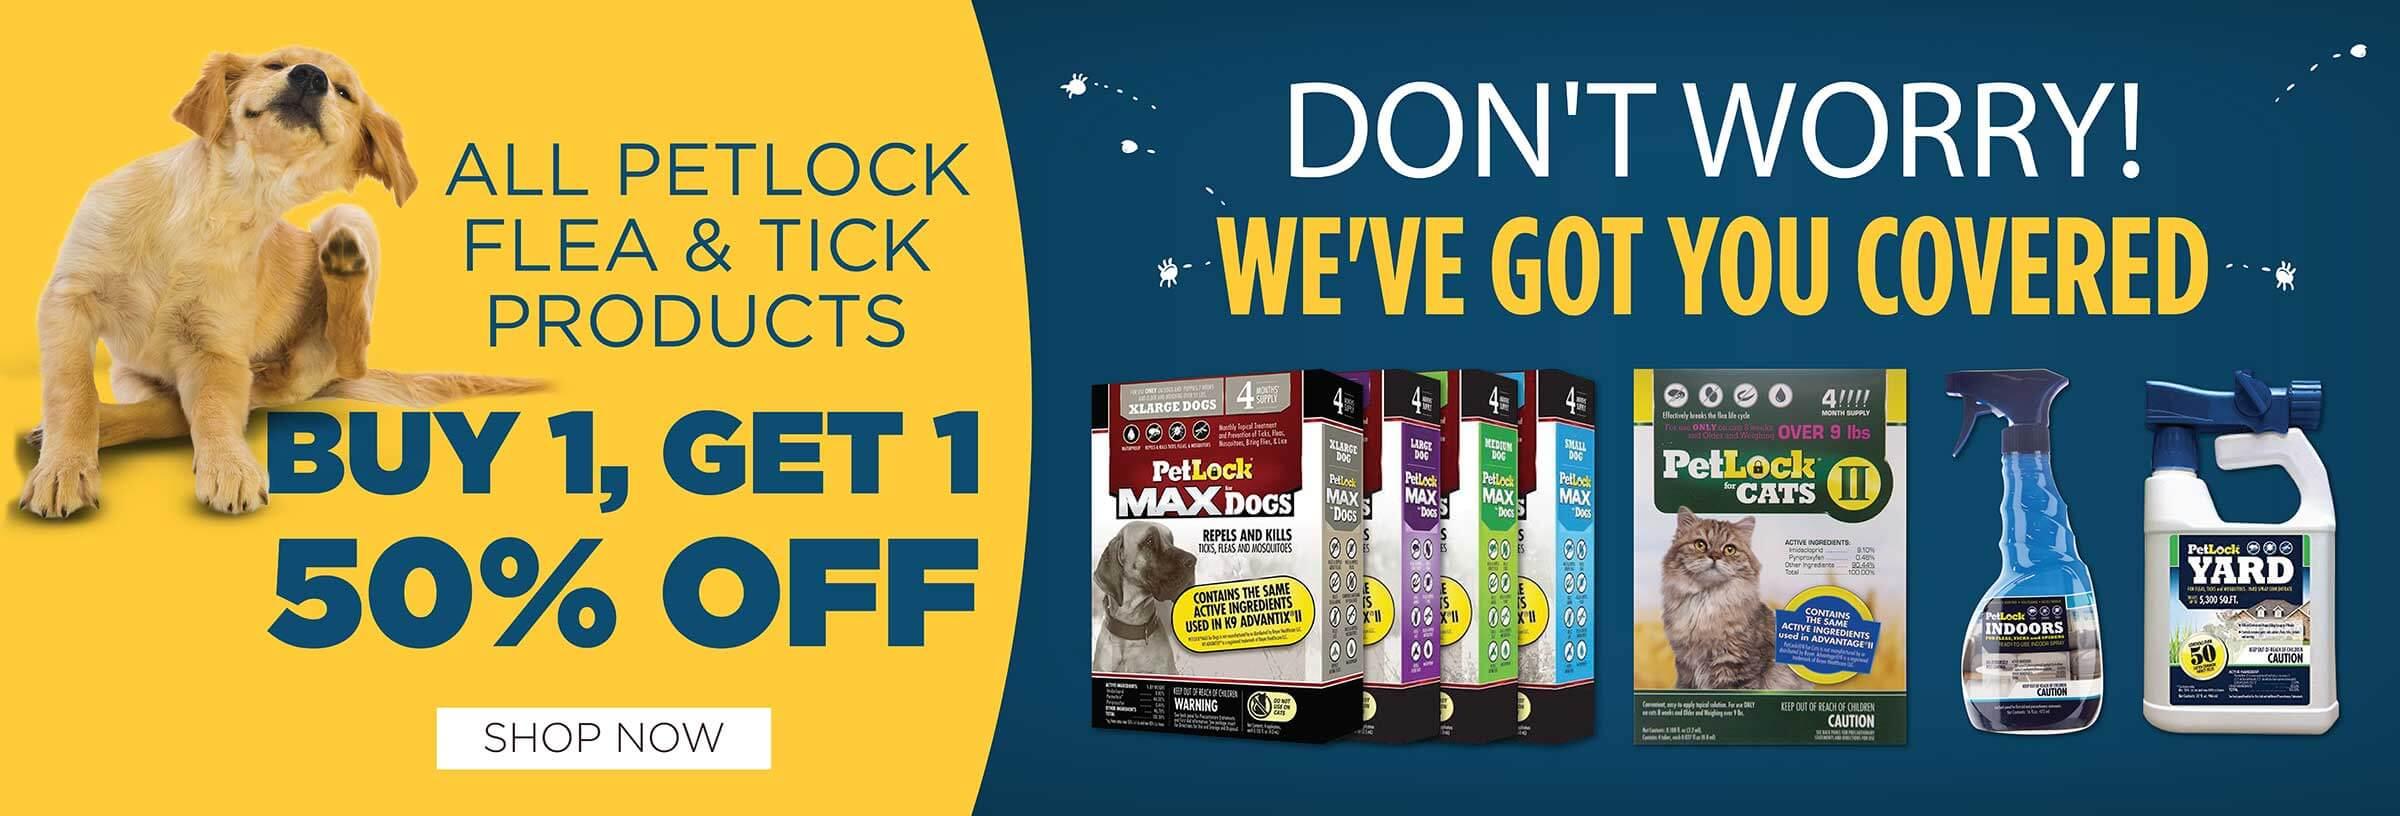 Petlock - Buy 1 Get 1 Half Off